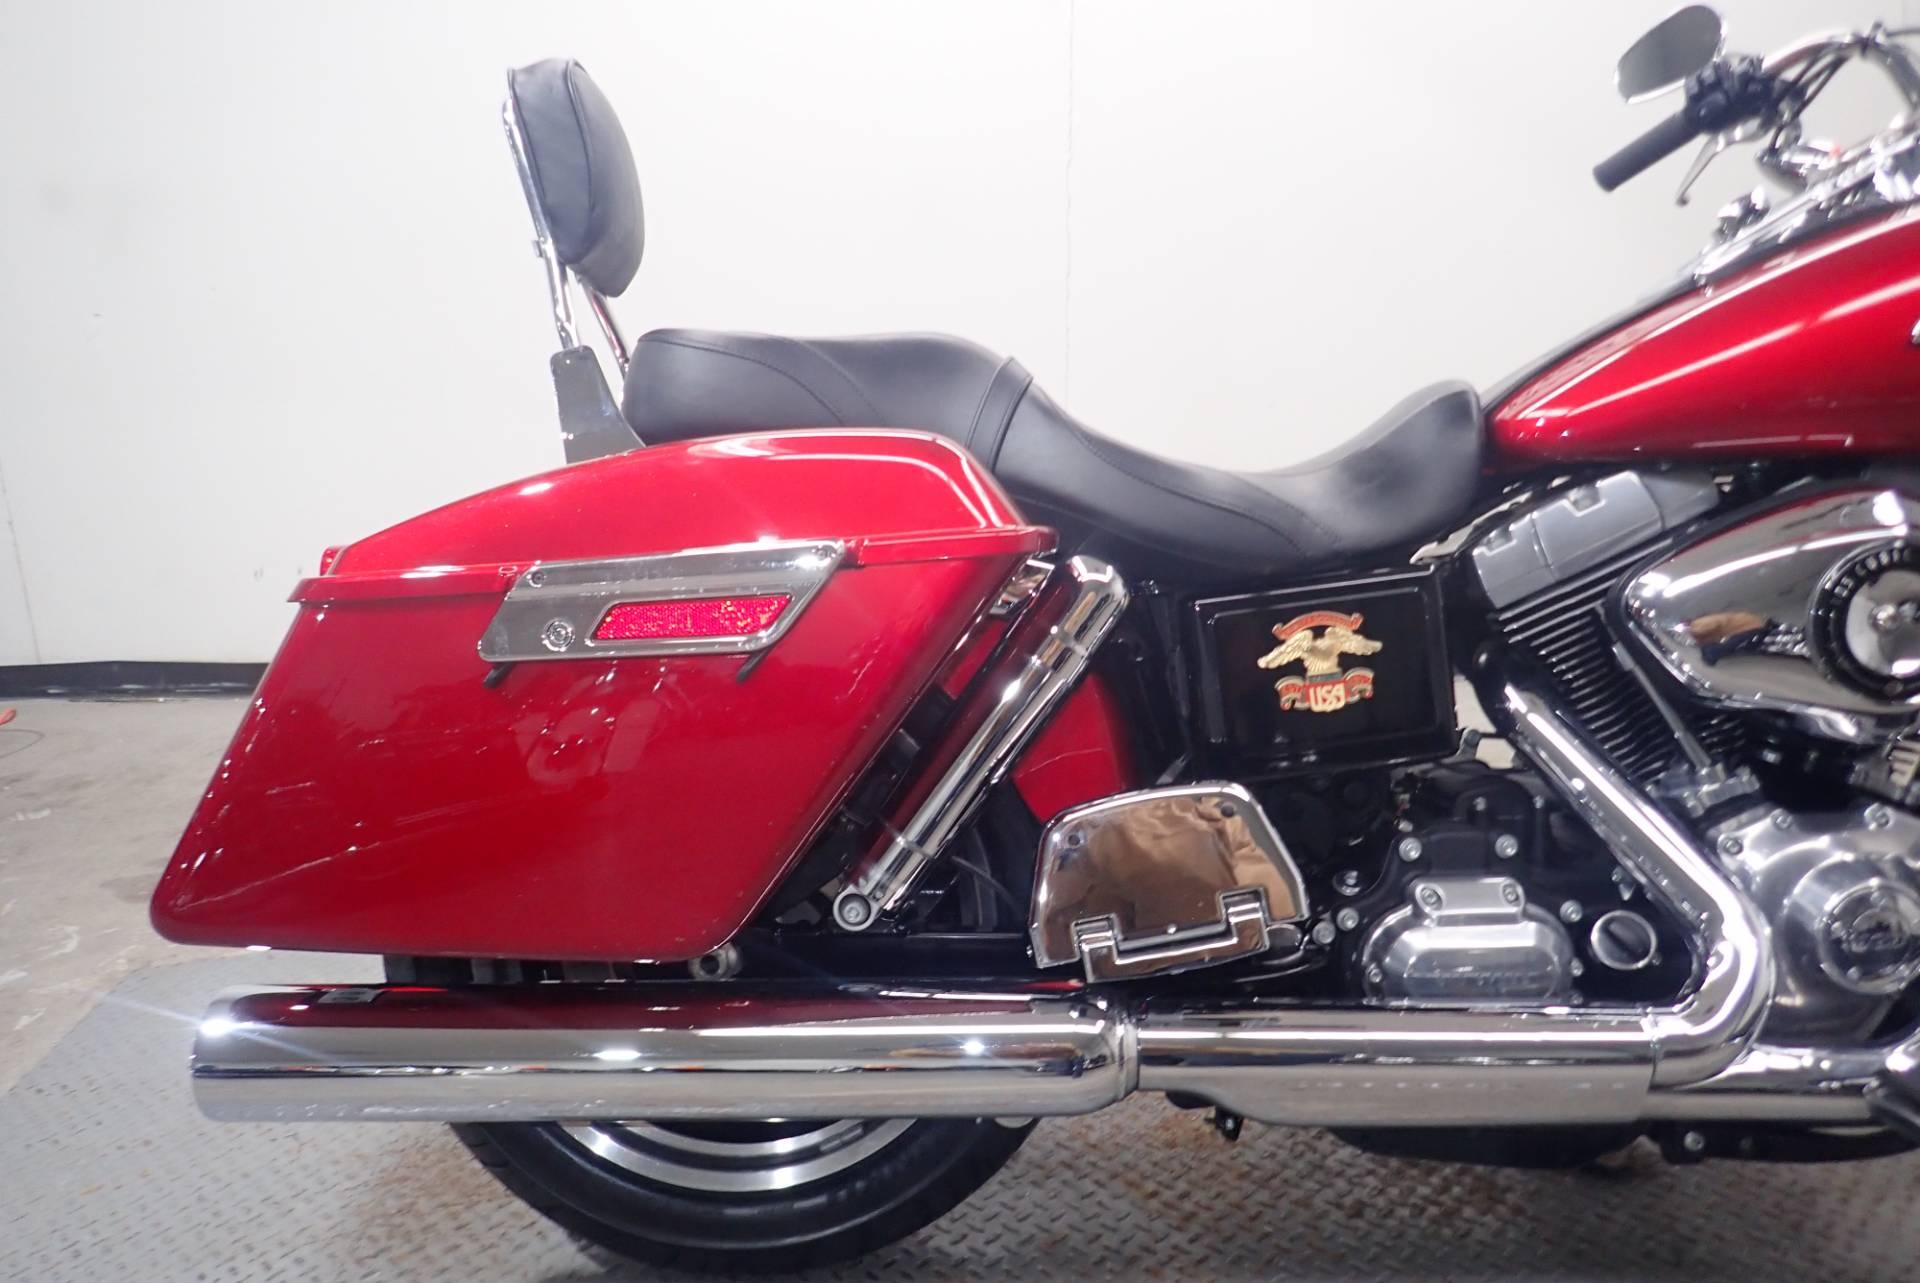 2012 Harley-Davidson Dyna Switchback 5